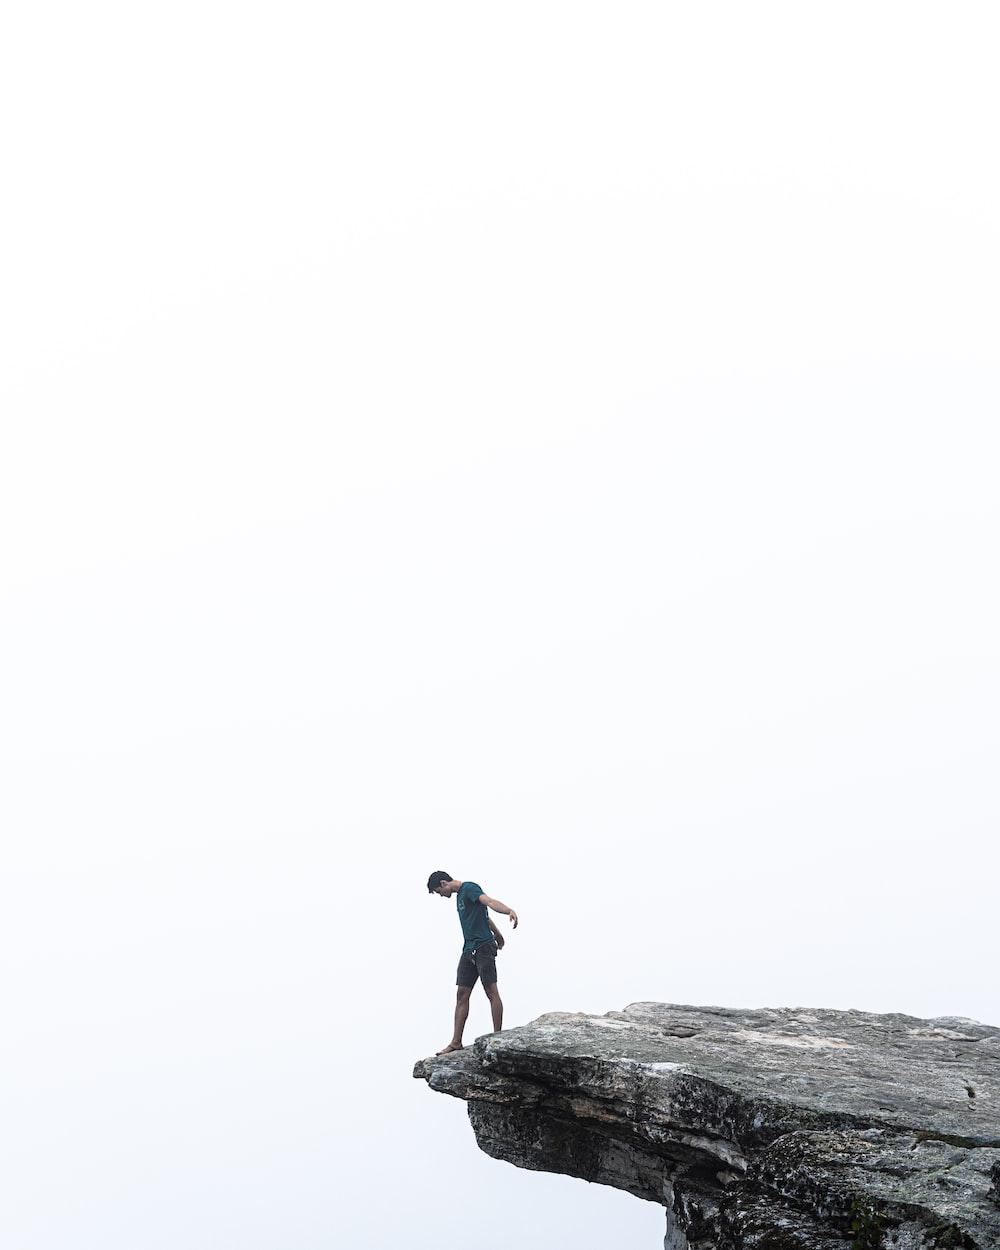 man in black shirt standing on rock